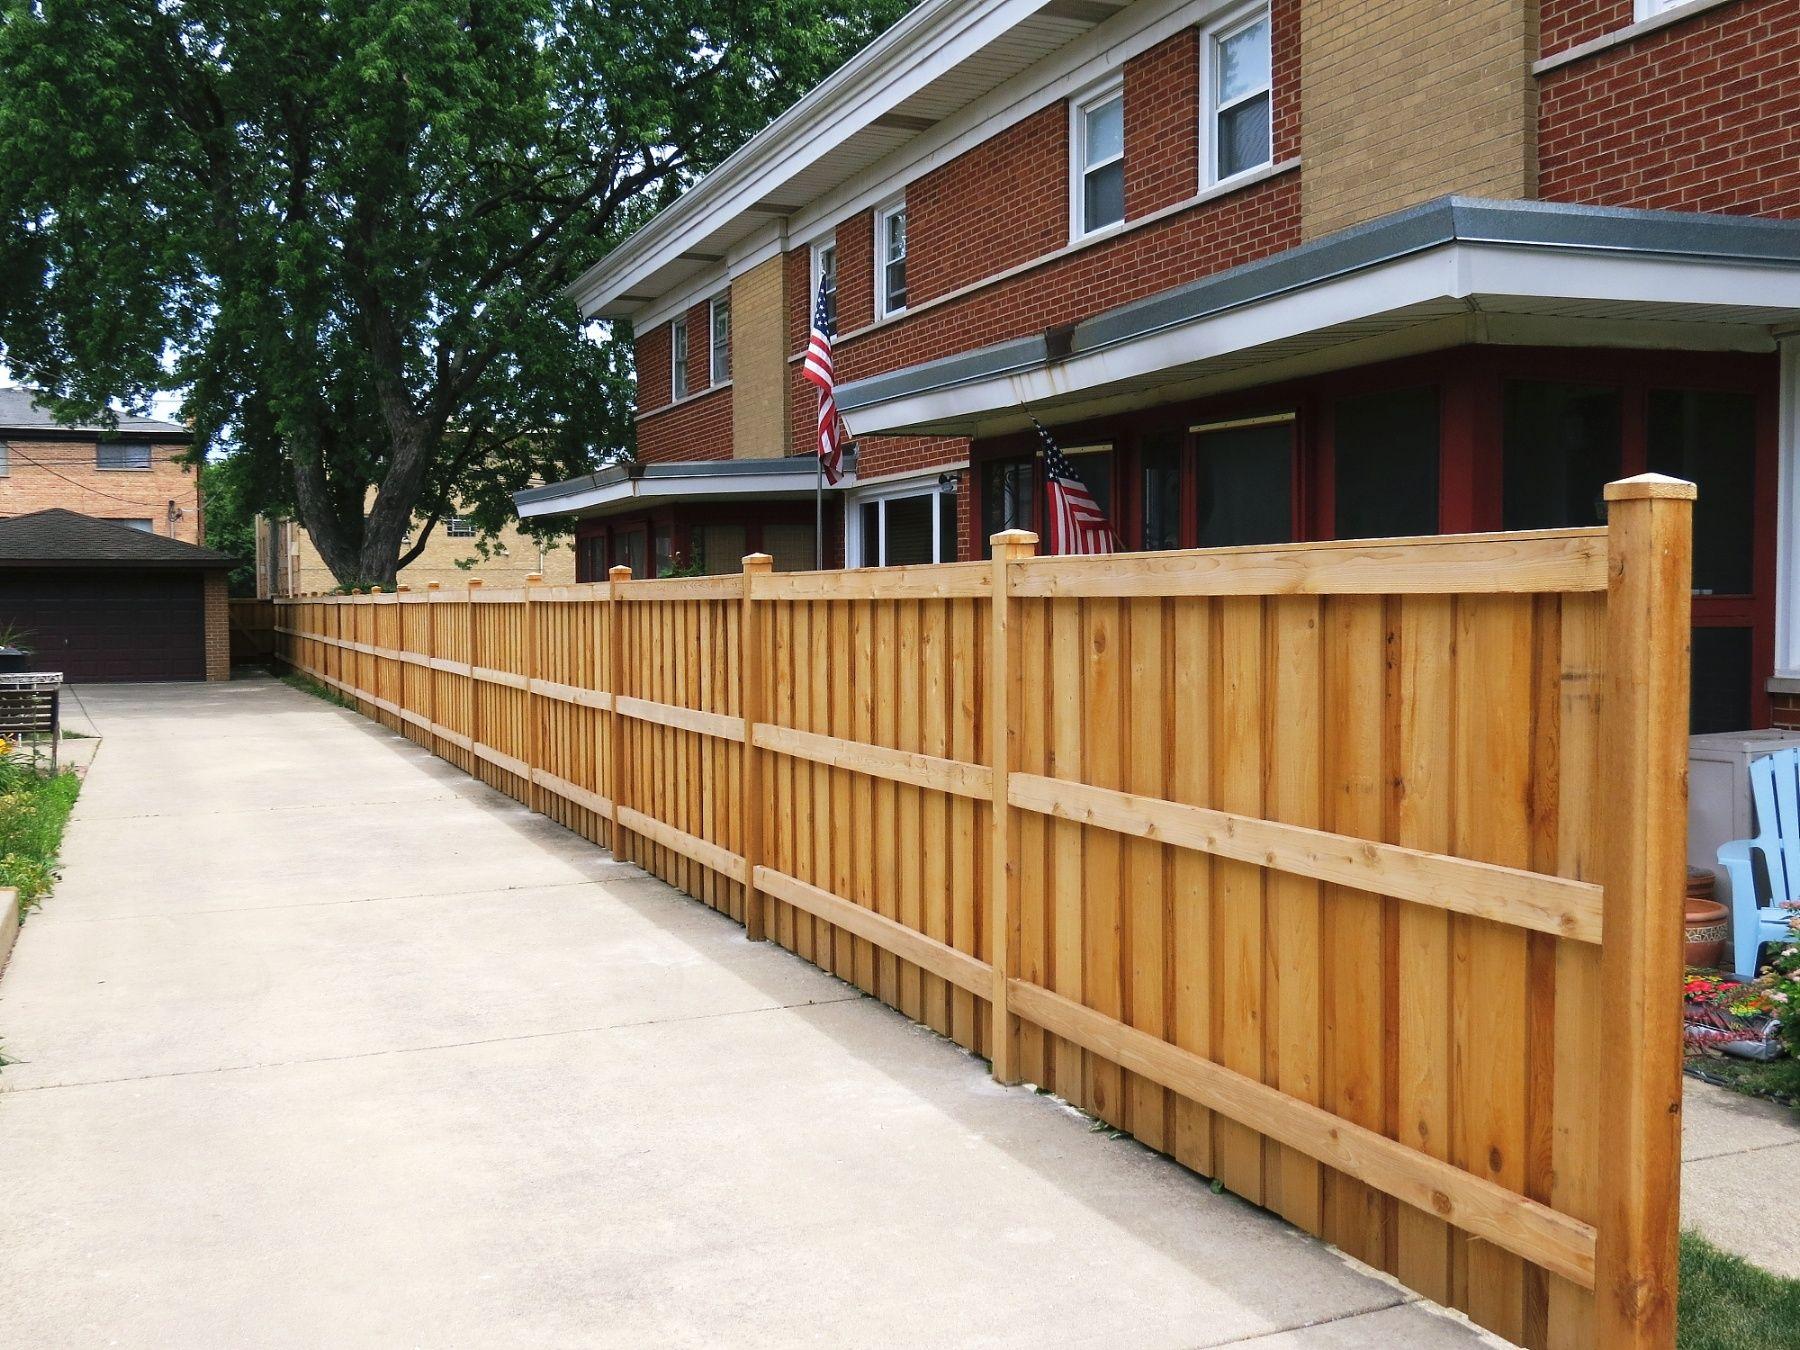 Bob Jaacks Rustic Wood Fencing Decks Cedar Board On Batten Solid Top Fence Image Proview